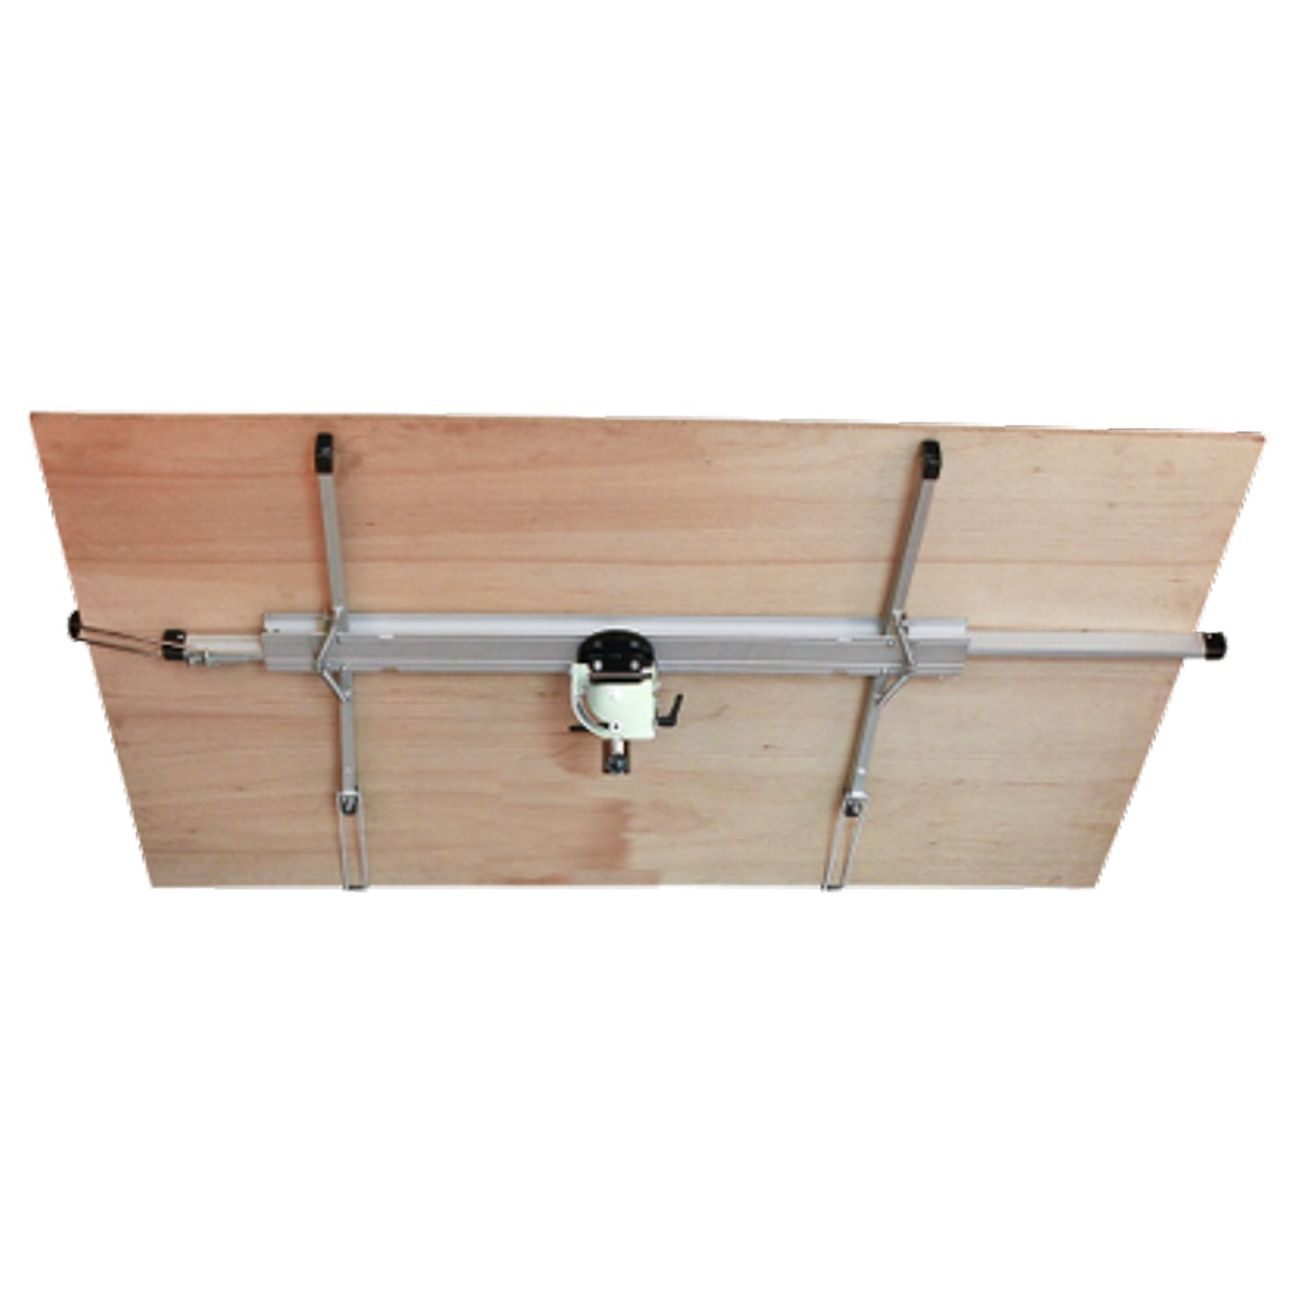 zubeh r traverse platten extension drywall lifter resized